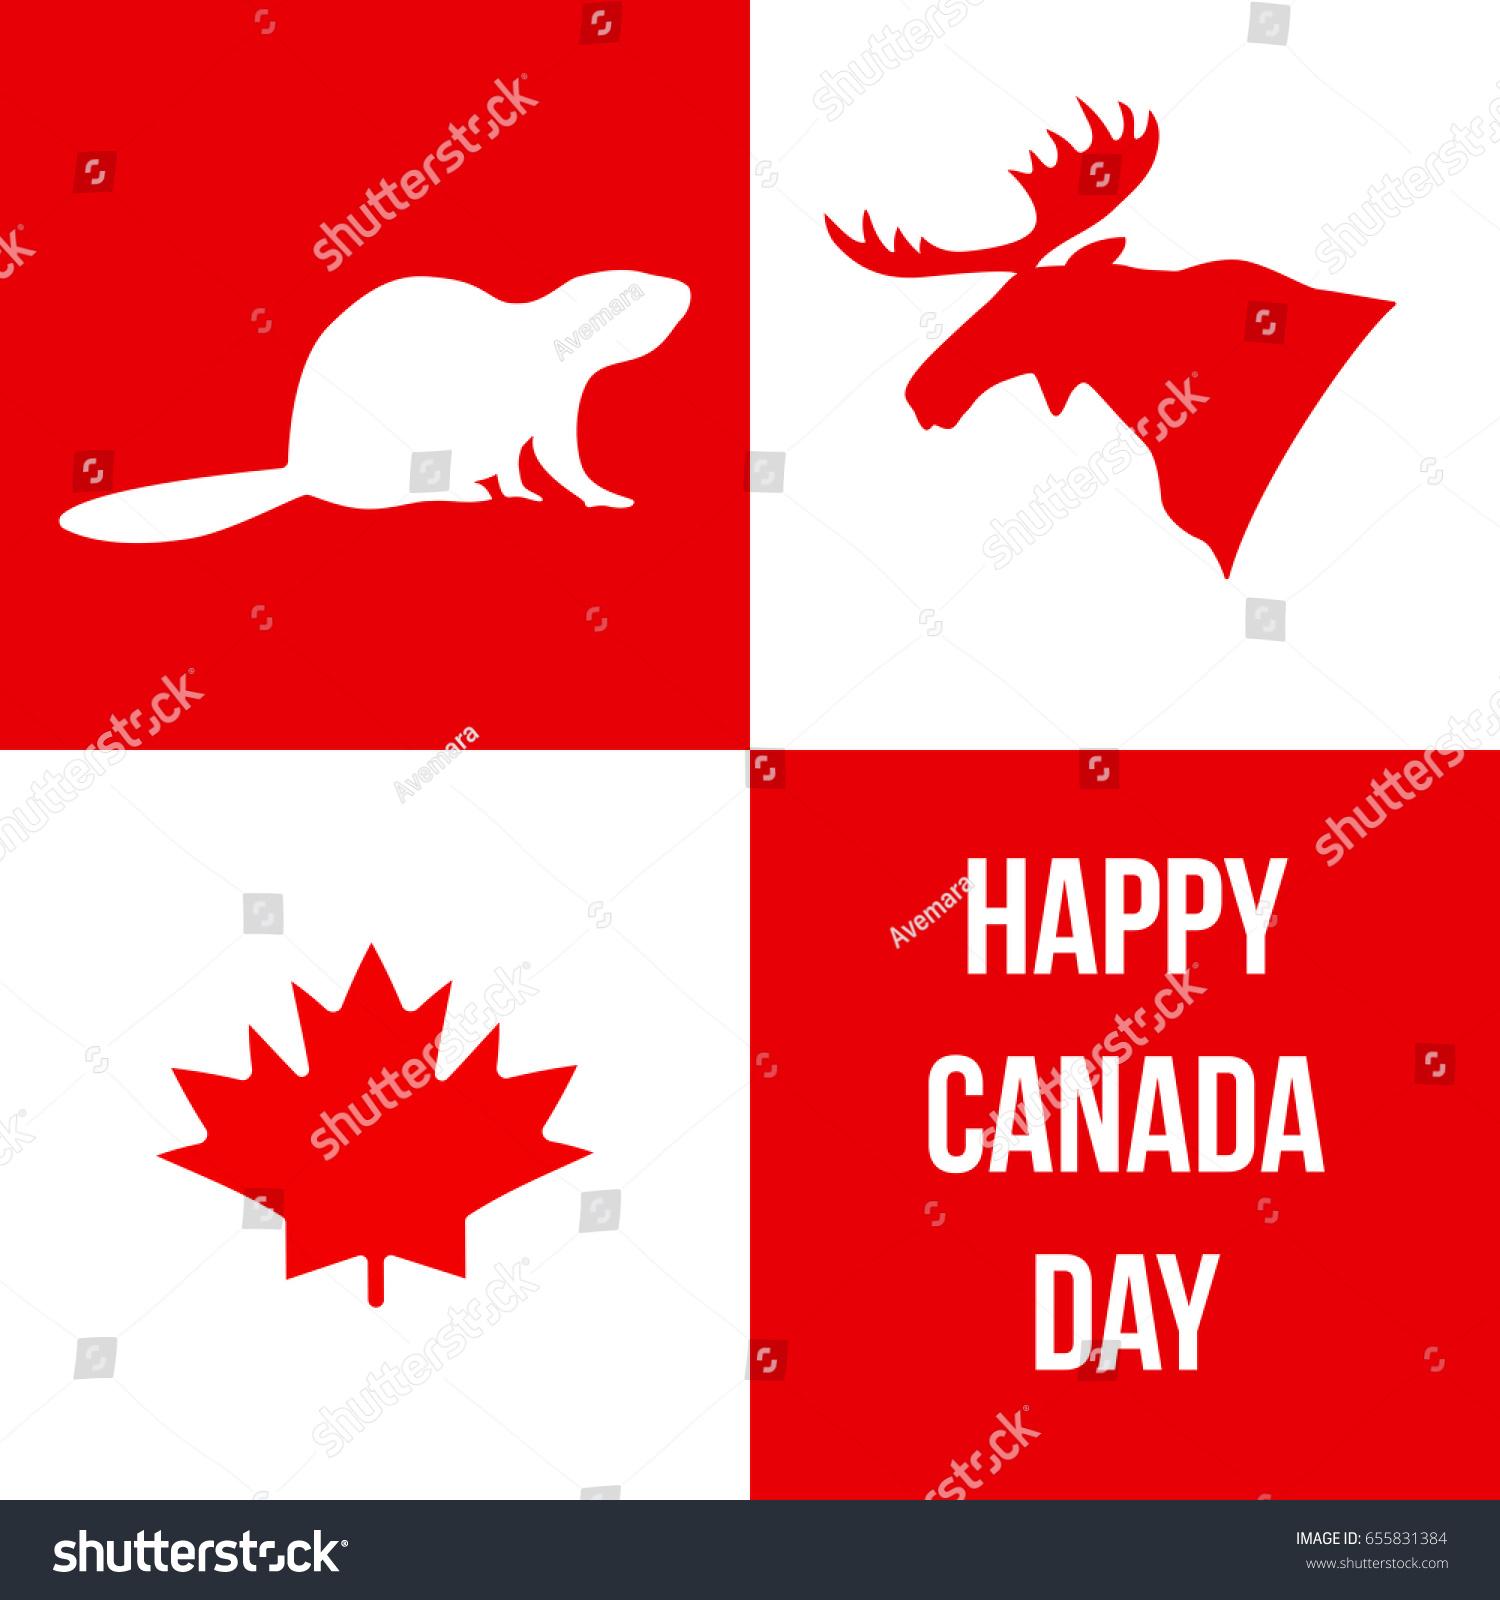 Happy Canada Day Silhouettes Canadian Symbols Stock Vector Royalty